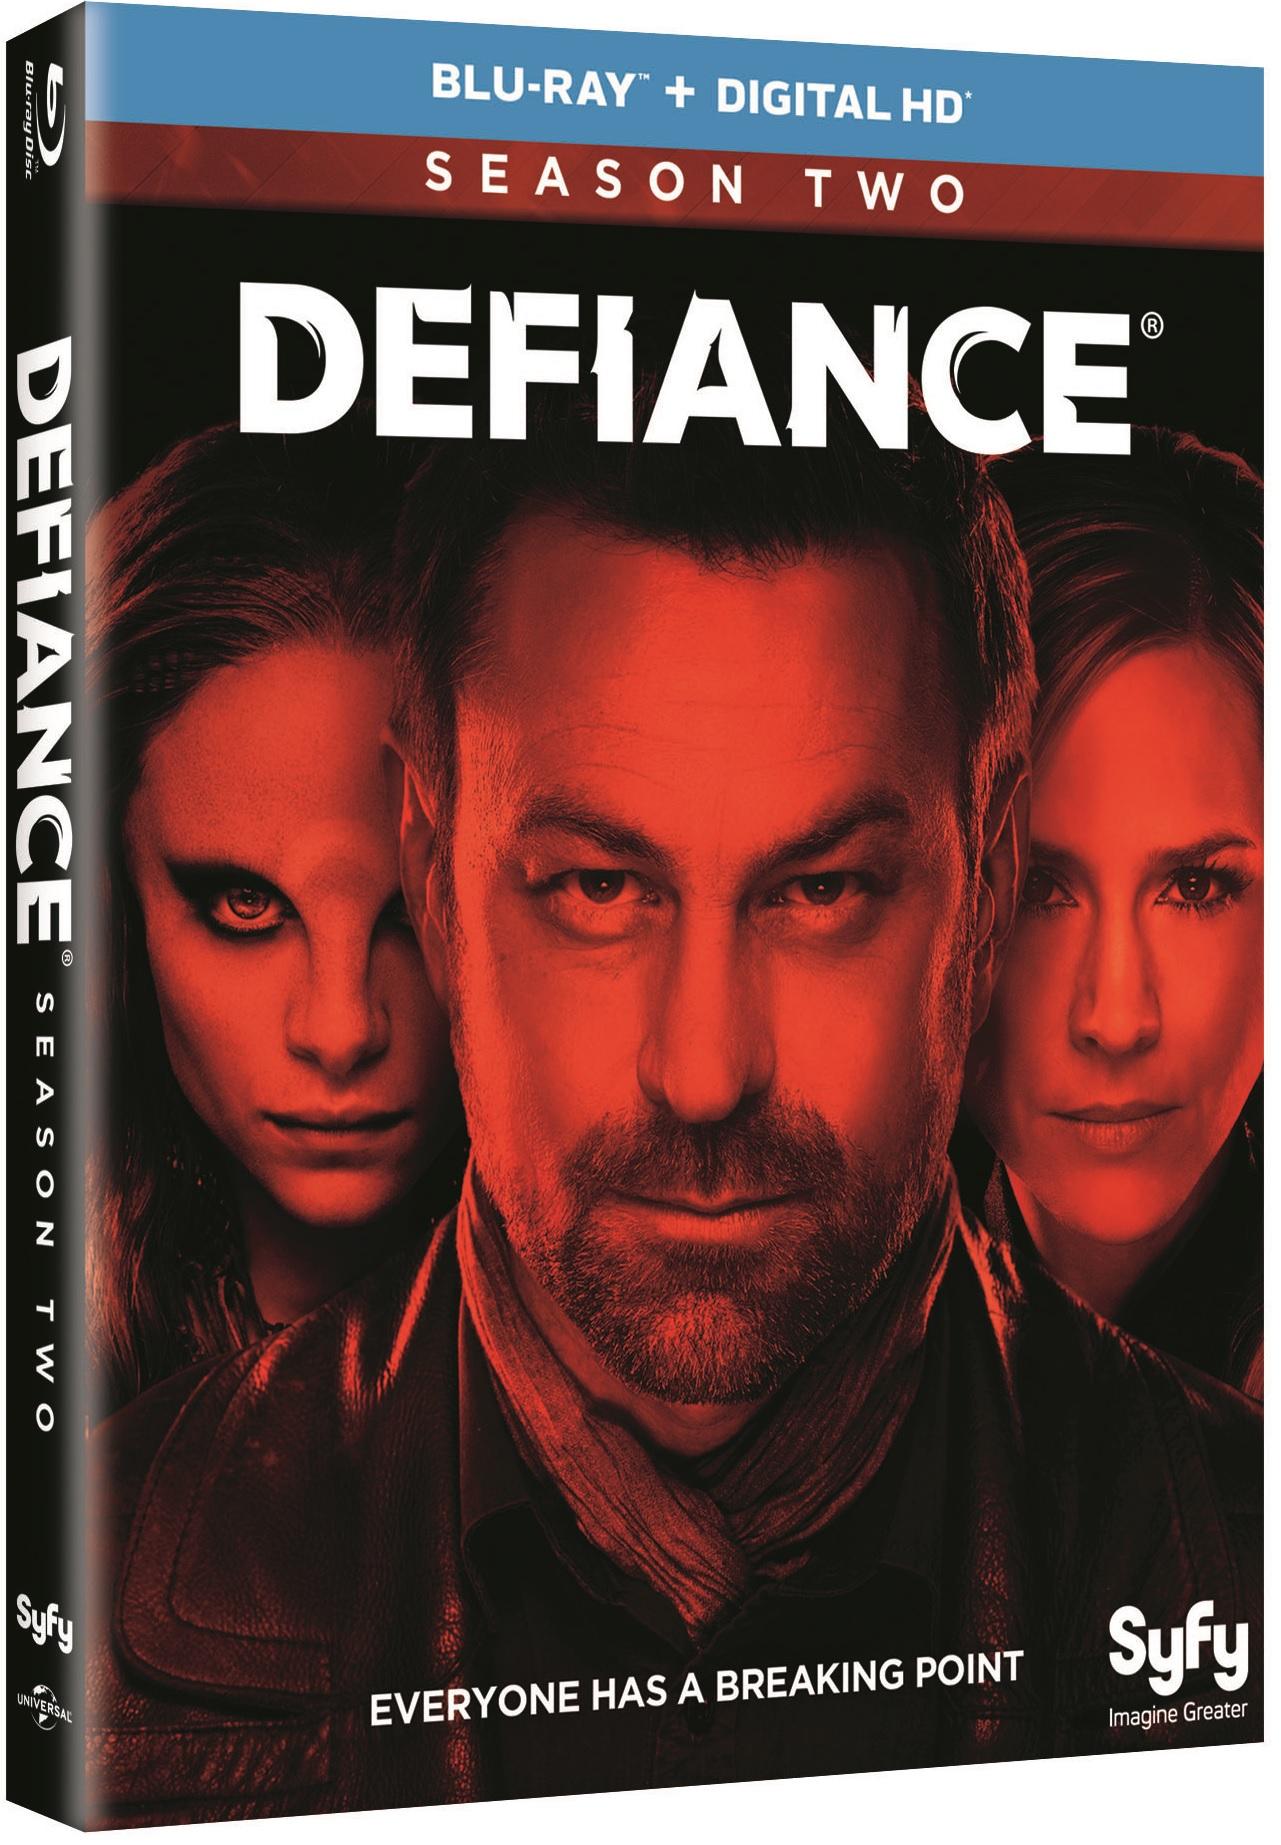 Defiance Season 2 Blu-ray Review